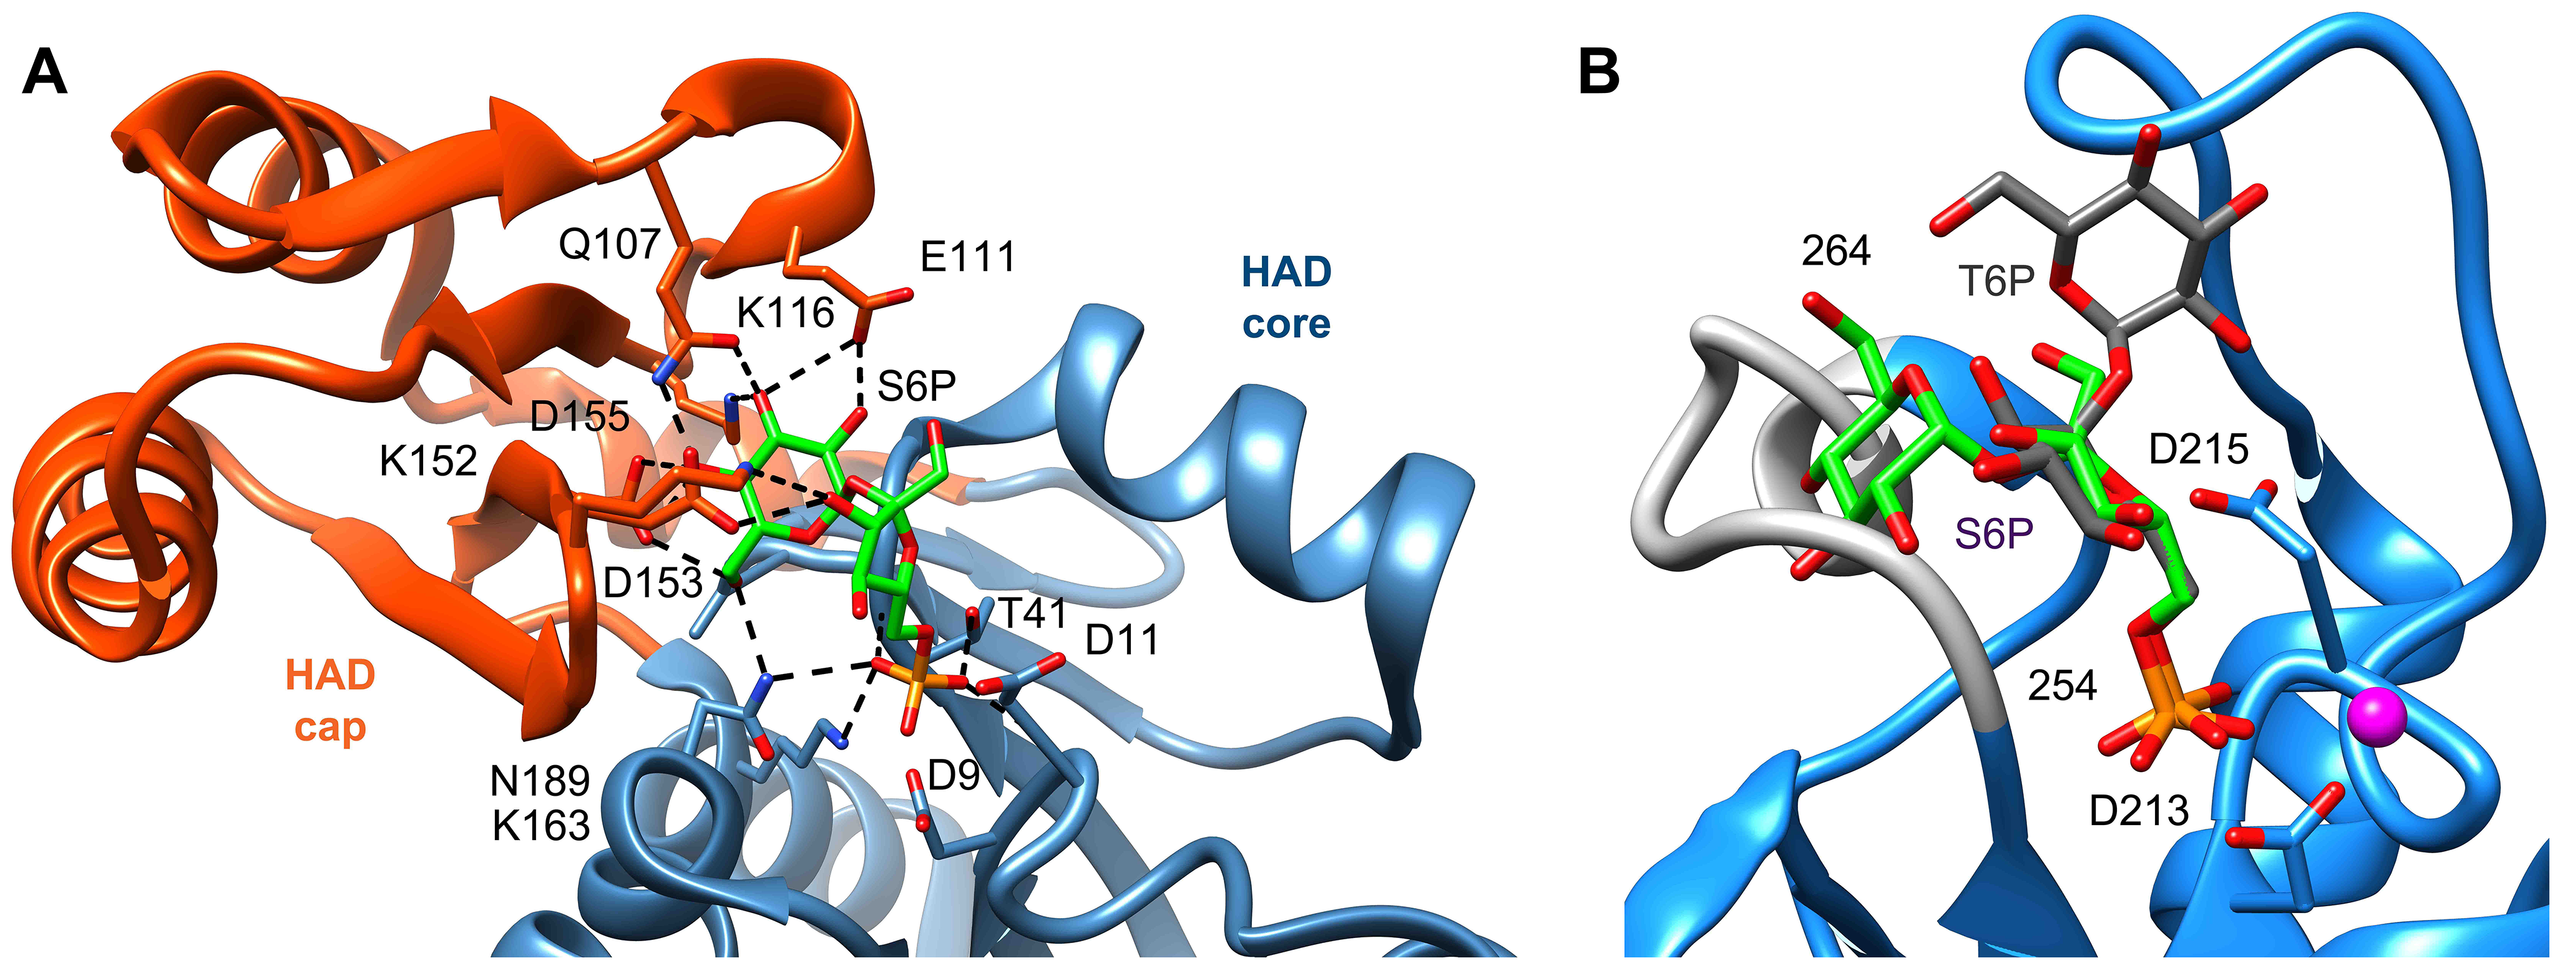 Comparison of ligand binding between sucrose-6-phosphate phosphatase and trehalose-6-phosphate phosphatase.